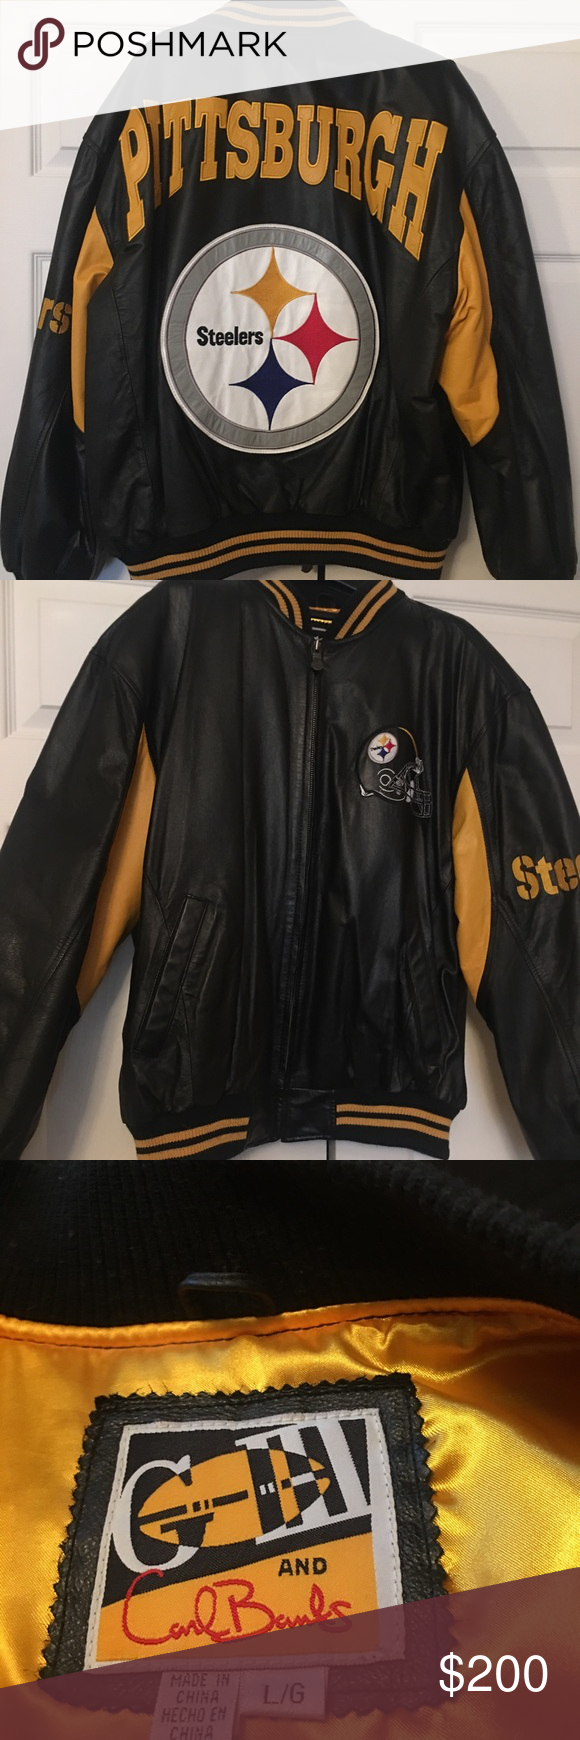 Vintage Pittsburgh Steelers Leather Jacket Jackets